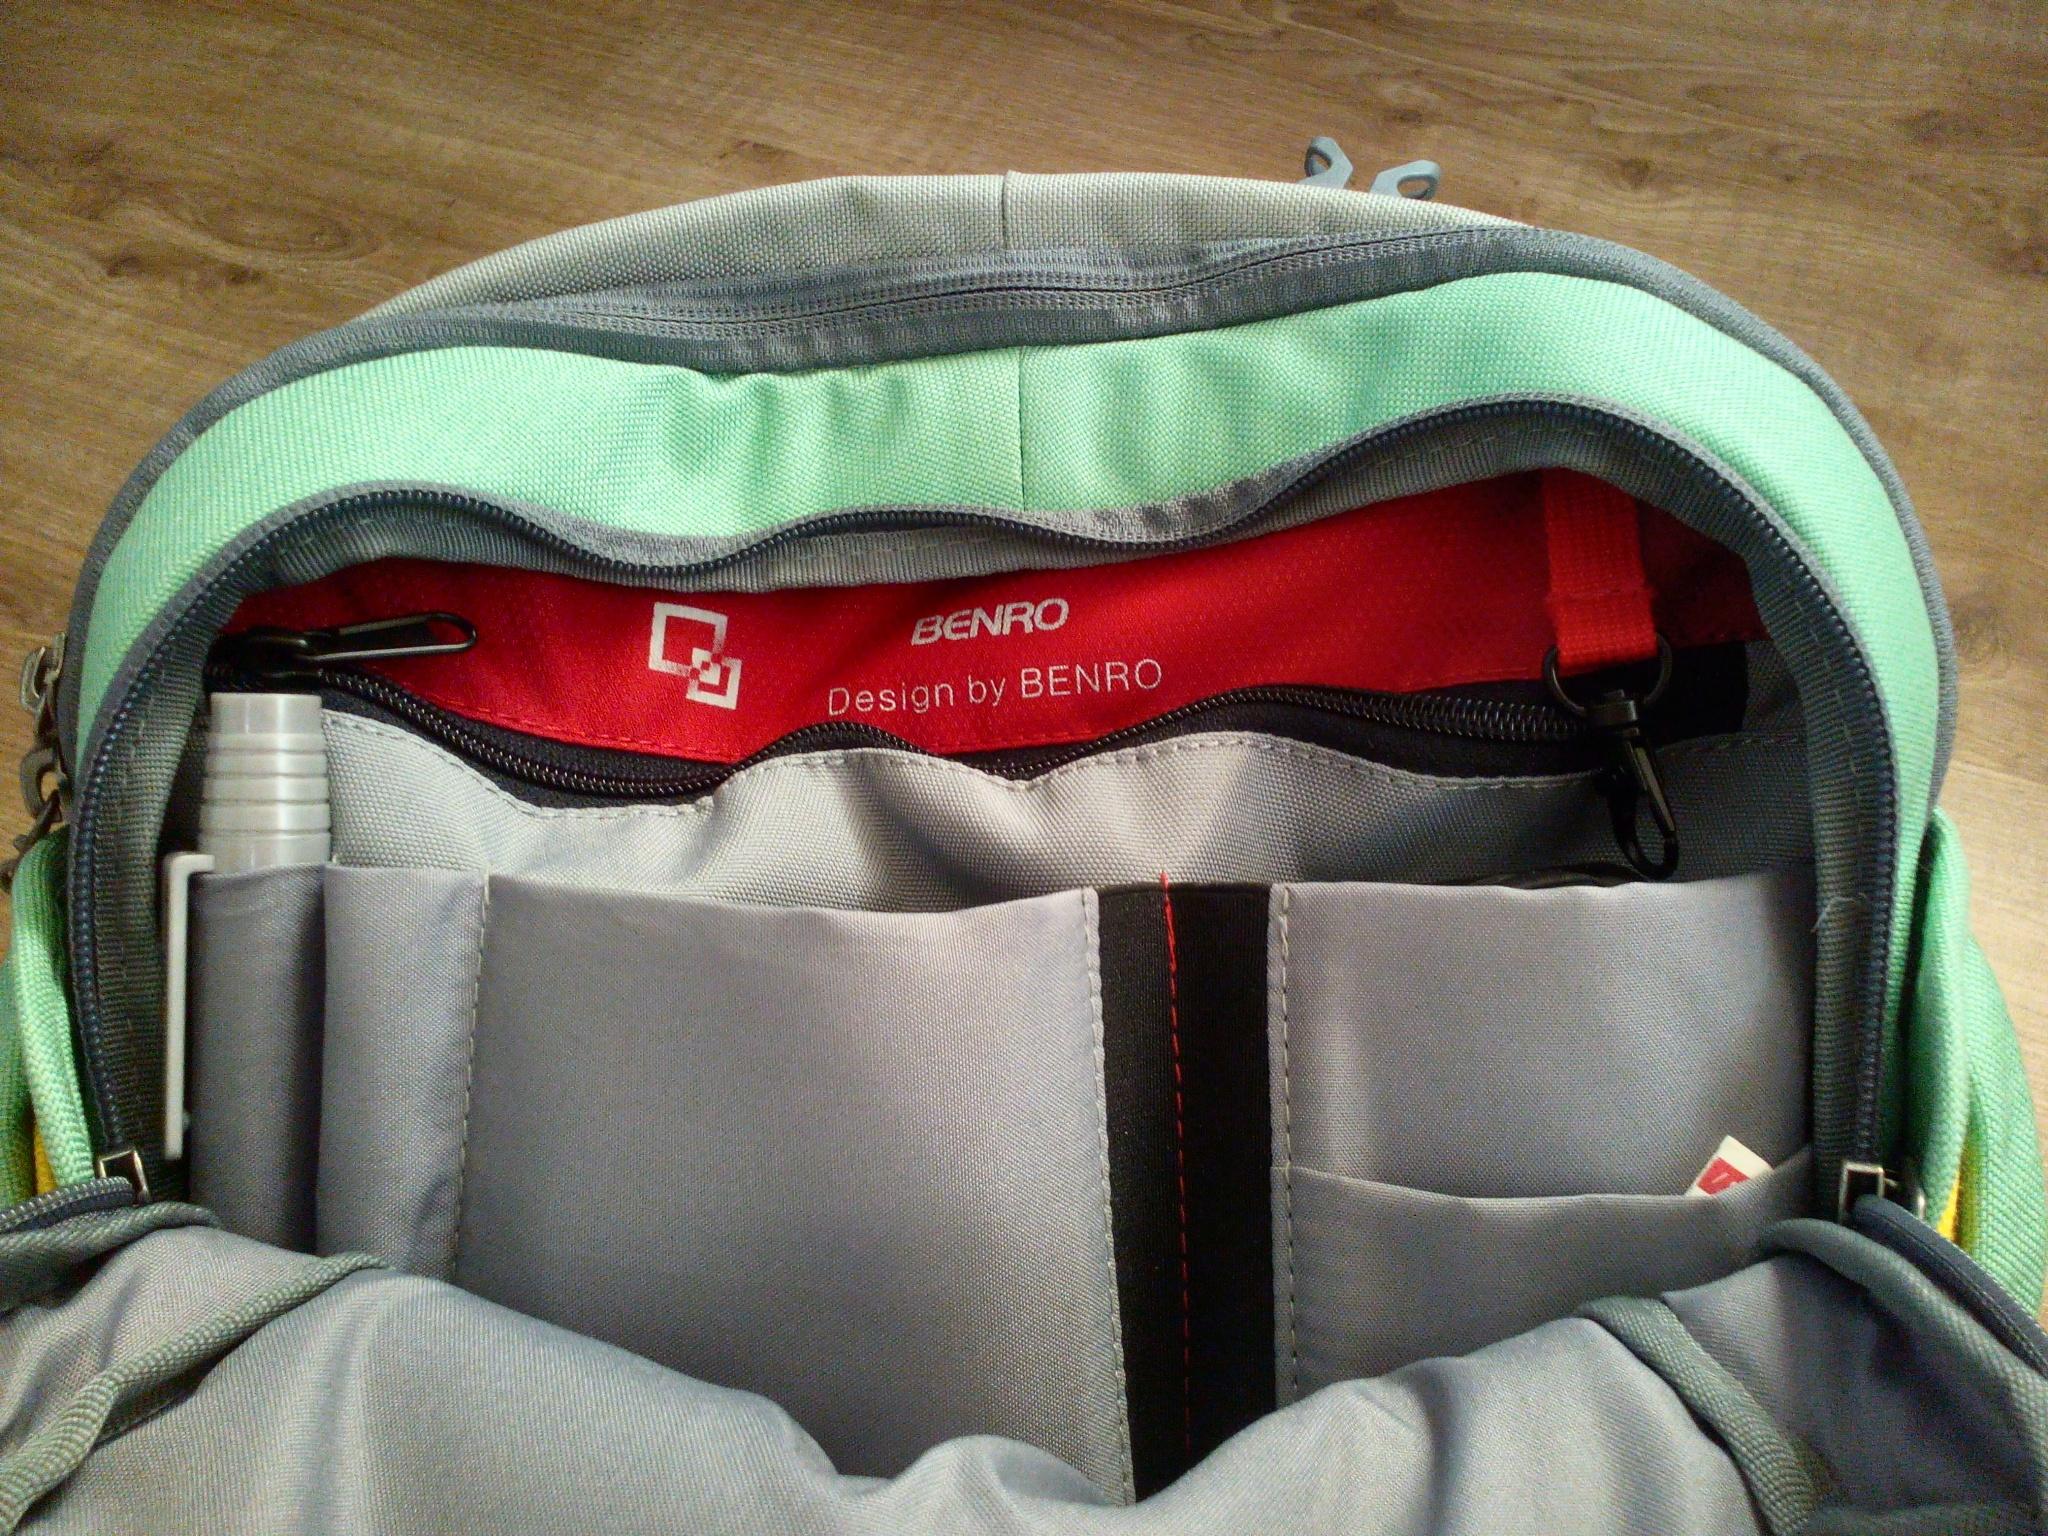 Вес фоторюкзака с аппаратурой фотографы 4you рюкзак summer lounge